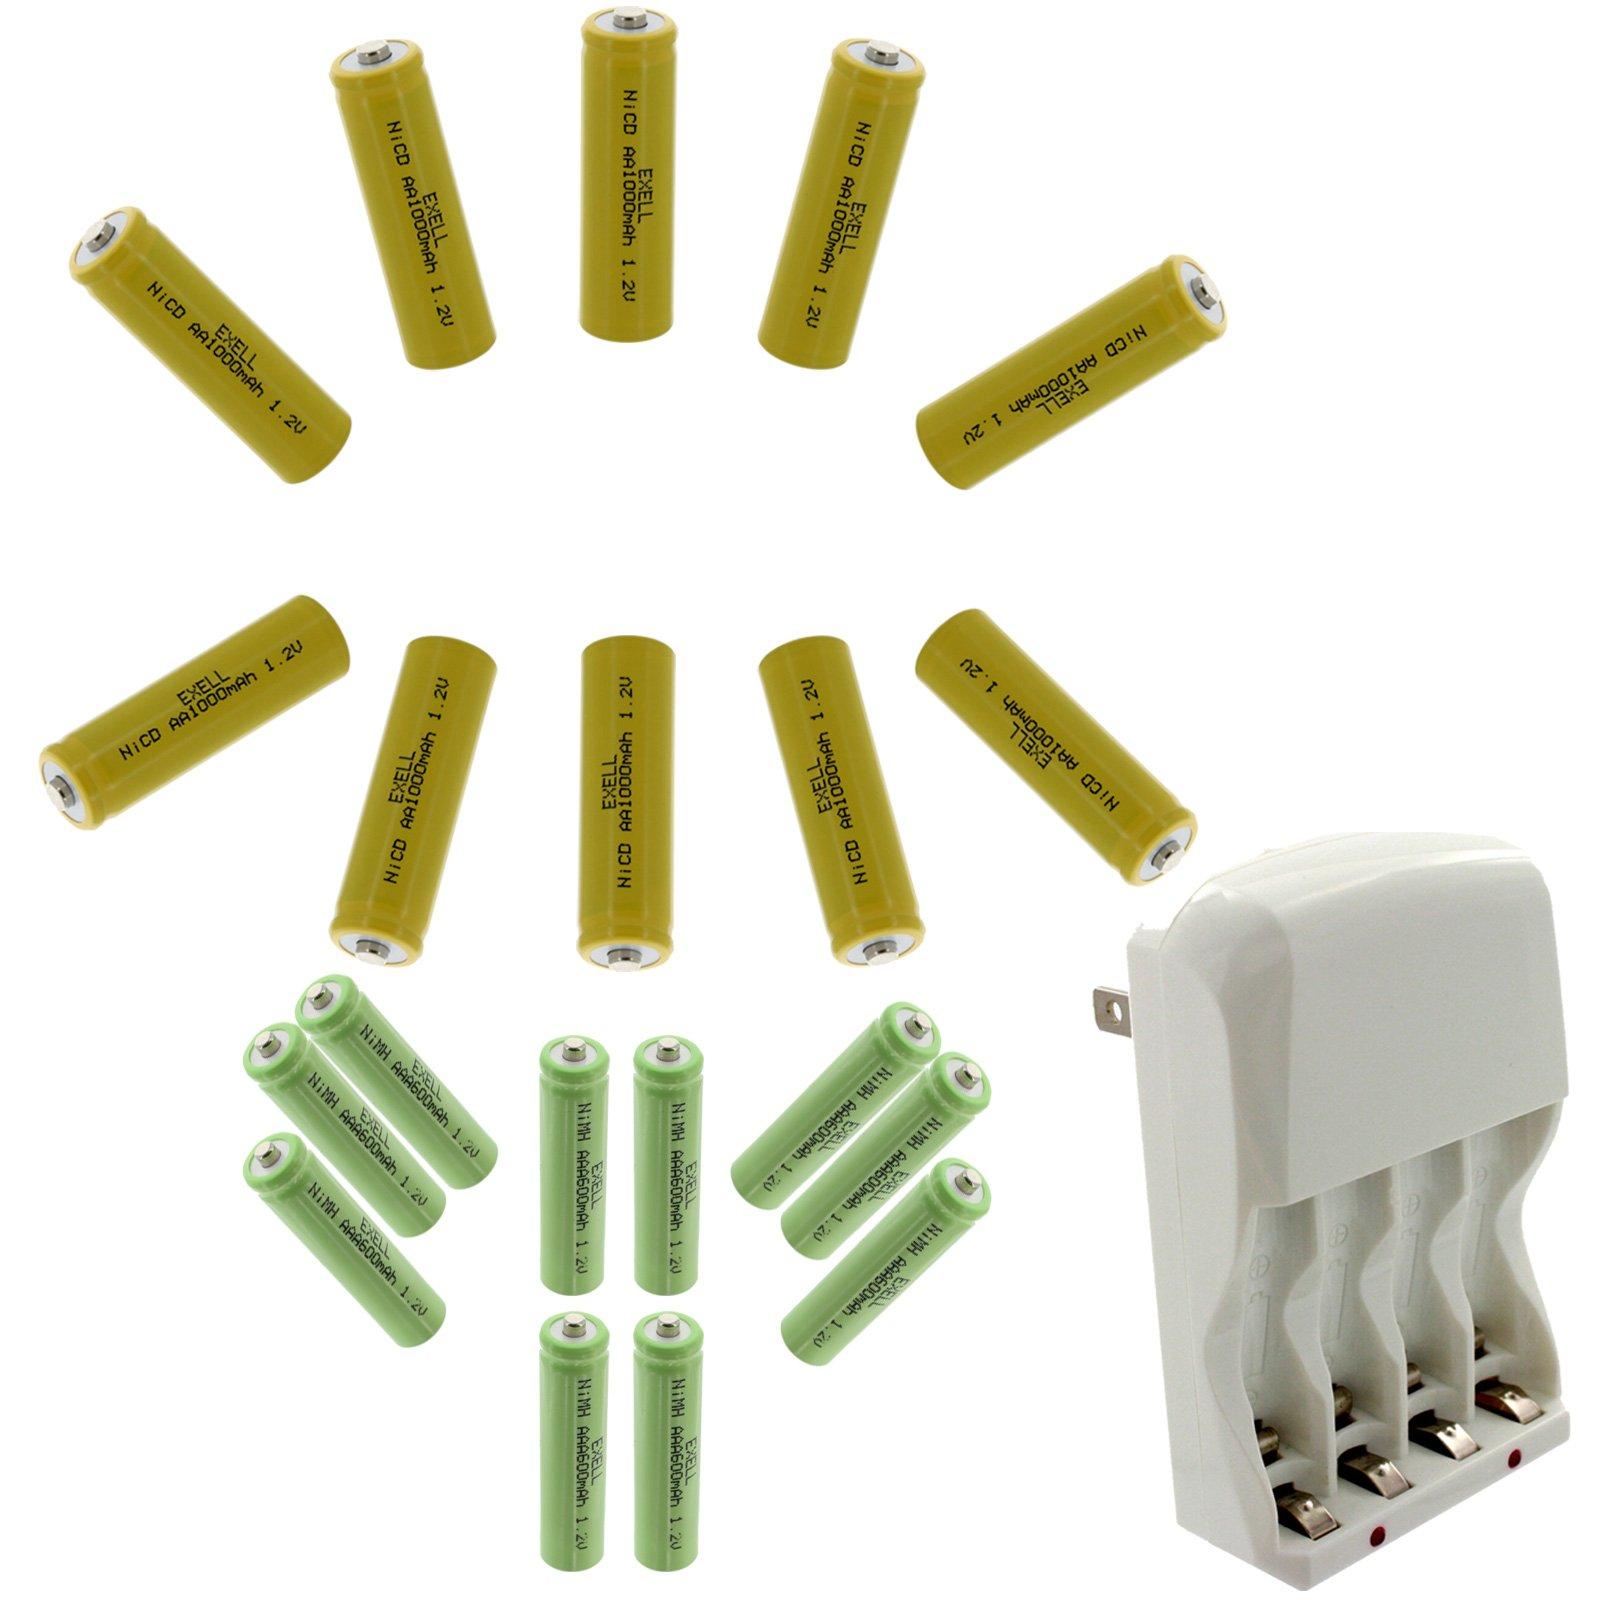 10x AA NiCD 1000mAh & 10x AAA 800mAh NiMH Rechargeable Batteries with Charger, Batteries Great for Path Lights Malibu Solar Garden Lights, Motion Sensor Lights, PDAs, Digital Cameras